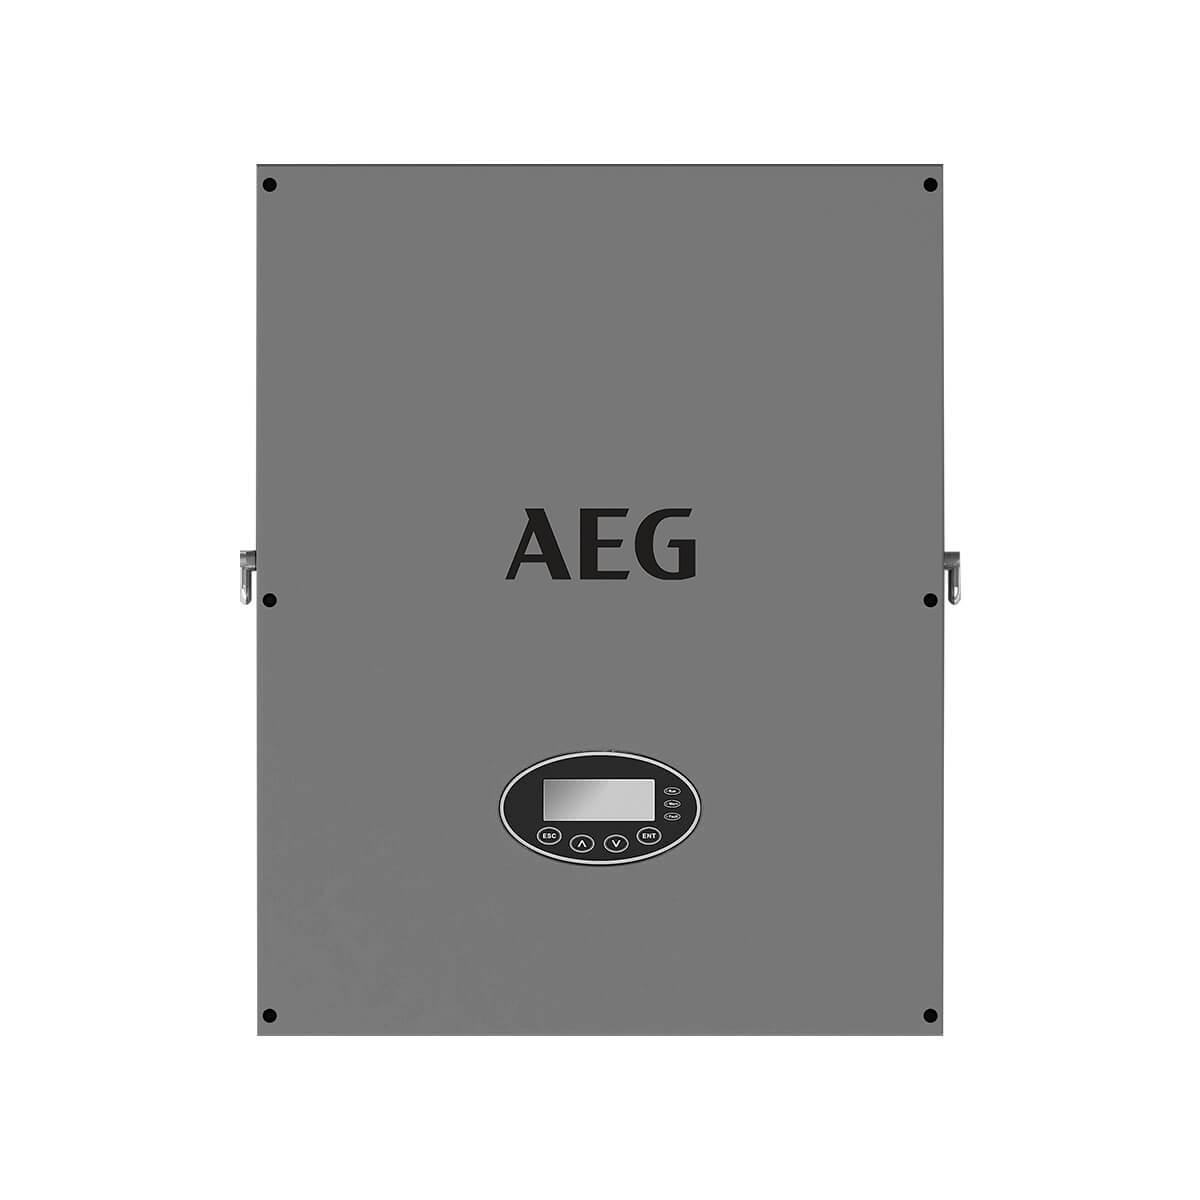 aeg 50kW inverter, aeg as-ic01 50kW inverter, aeg as-ic01-50000-2 inverter, aeg as-ic01-50000-2, aeg as-ic01 50kW, AEG 50 KW